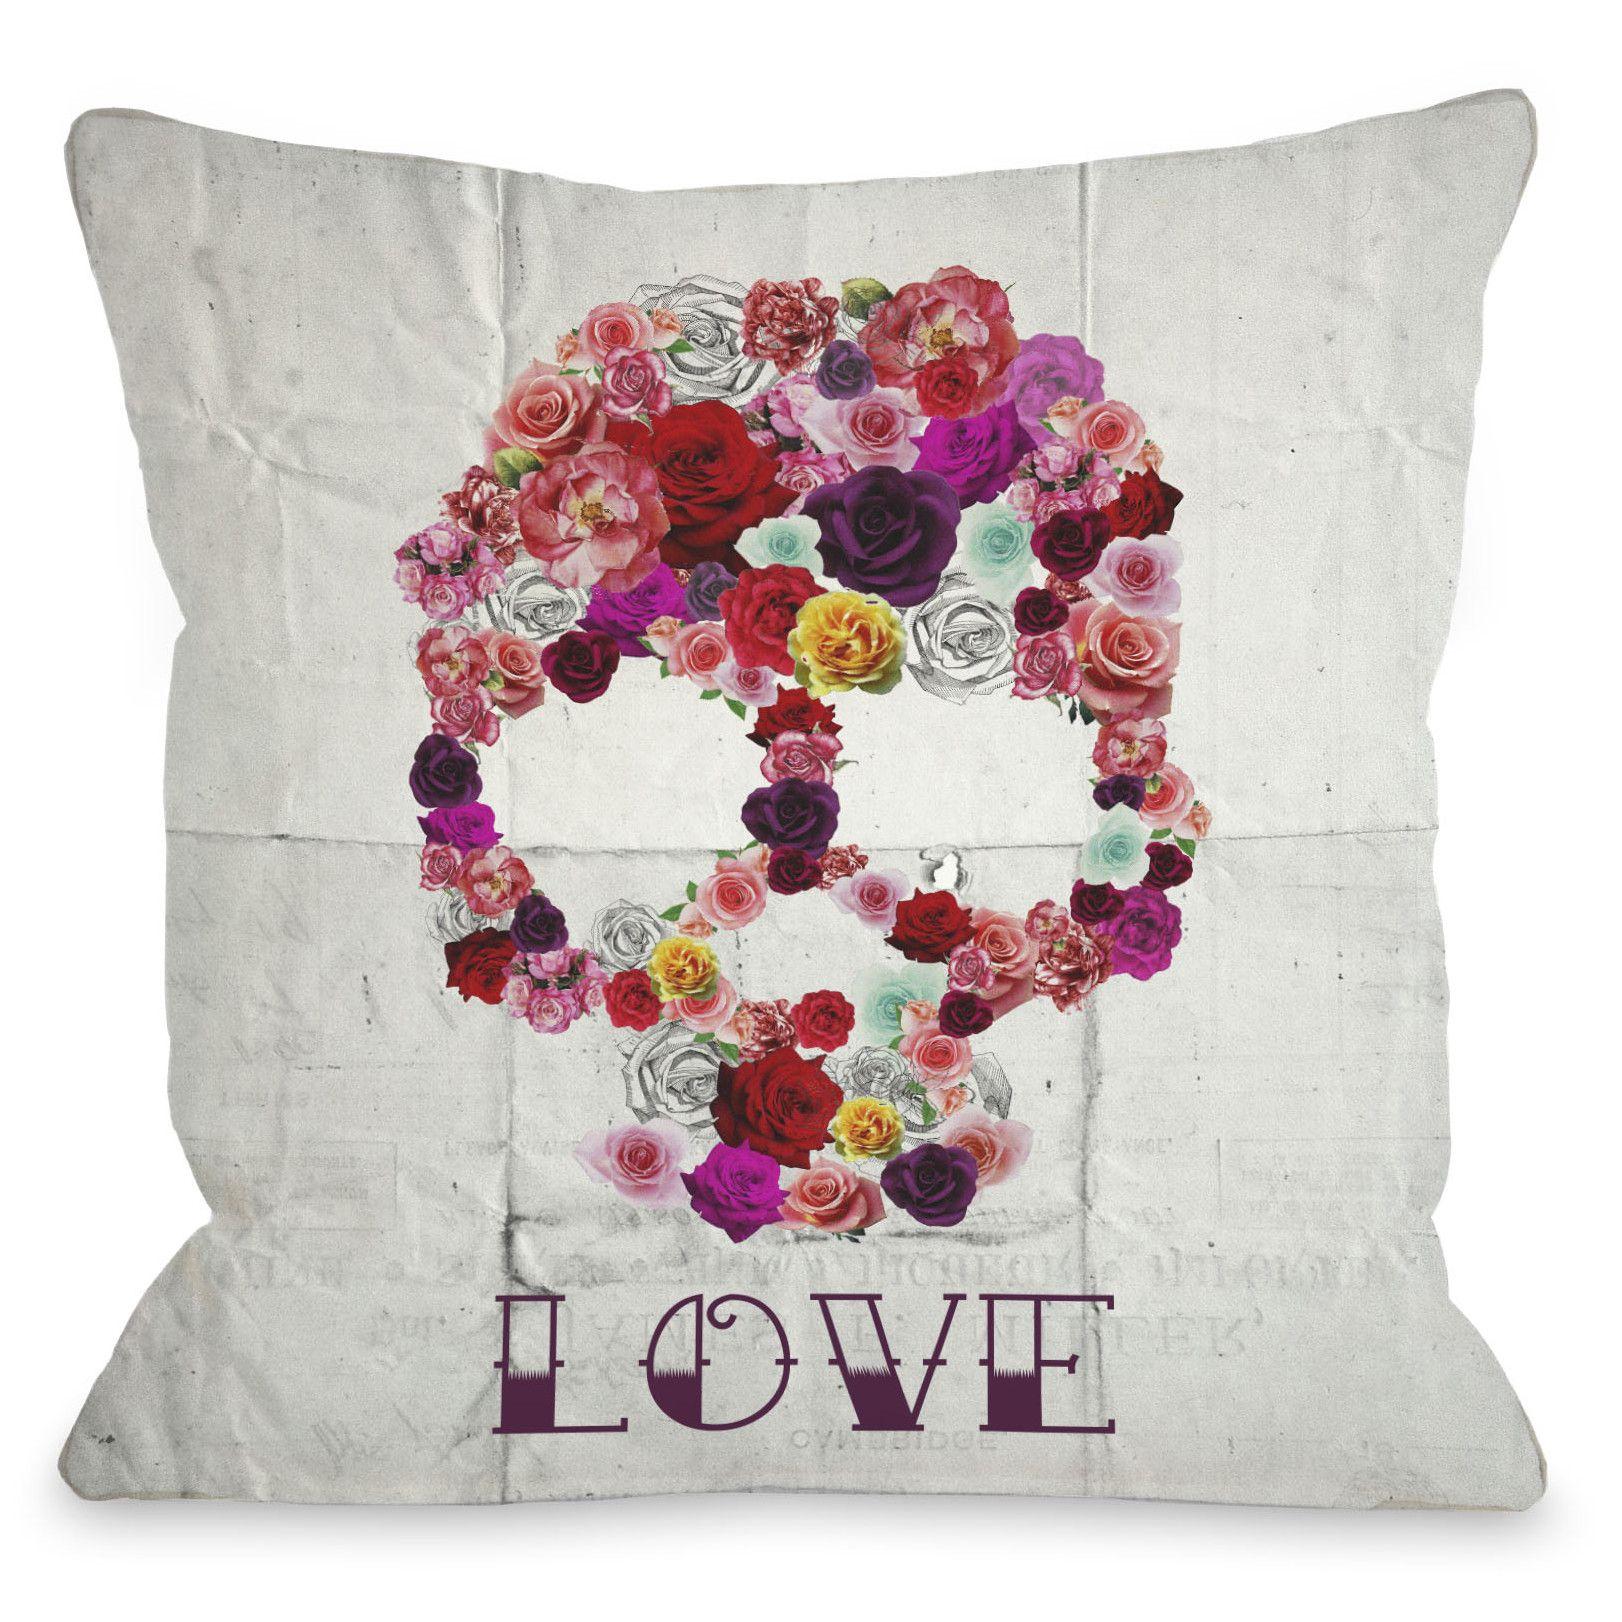 One Bella Casa Oliver Gal Bed of Roses Duvet Cover Collection | AllModern